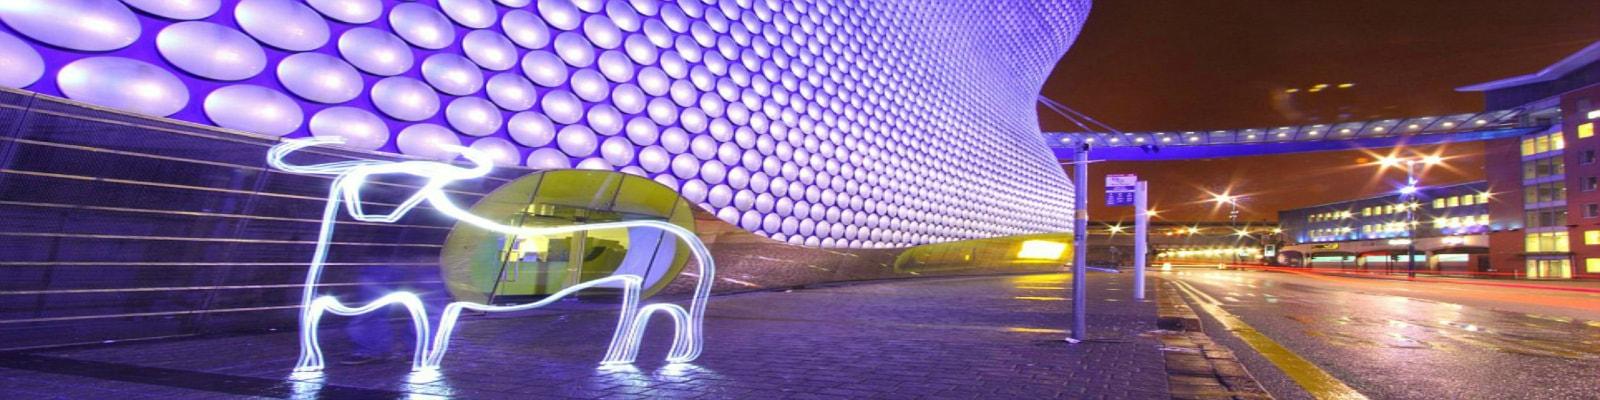 Birmingham-bullring-shopping-center-final-01